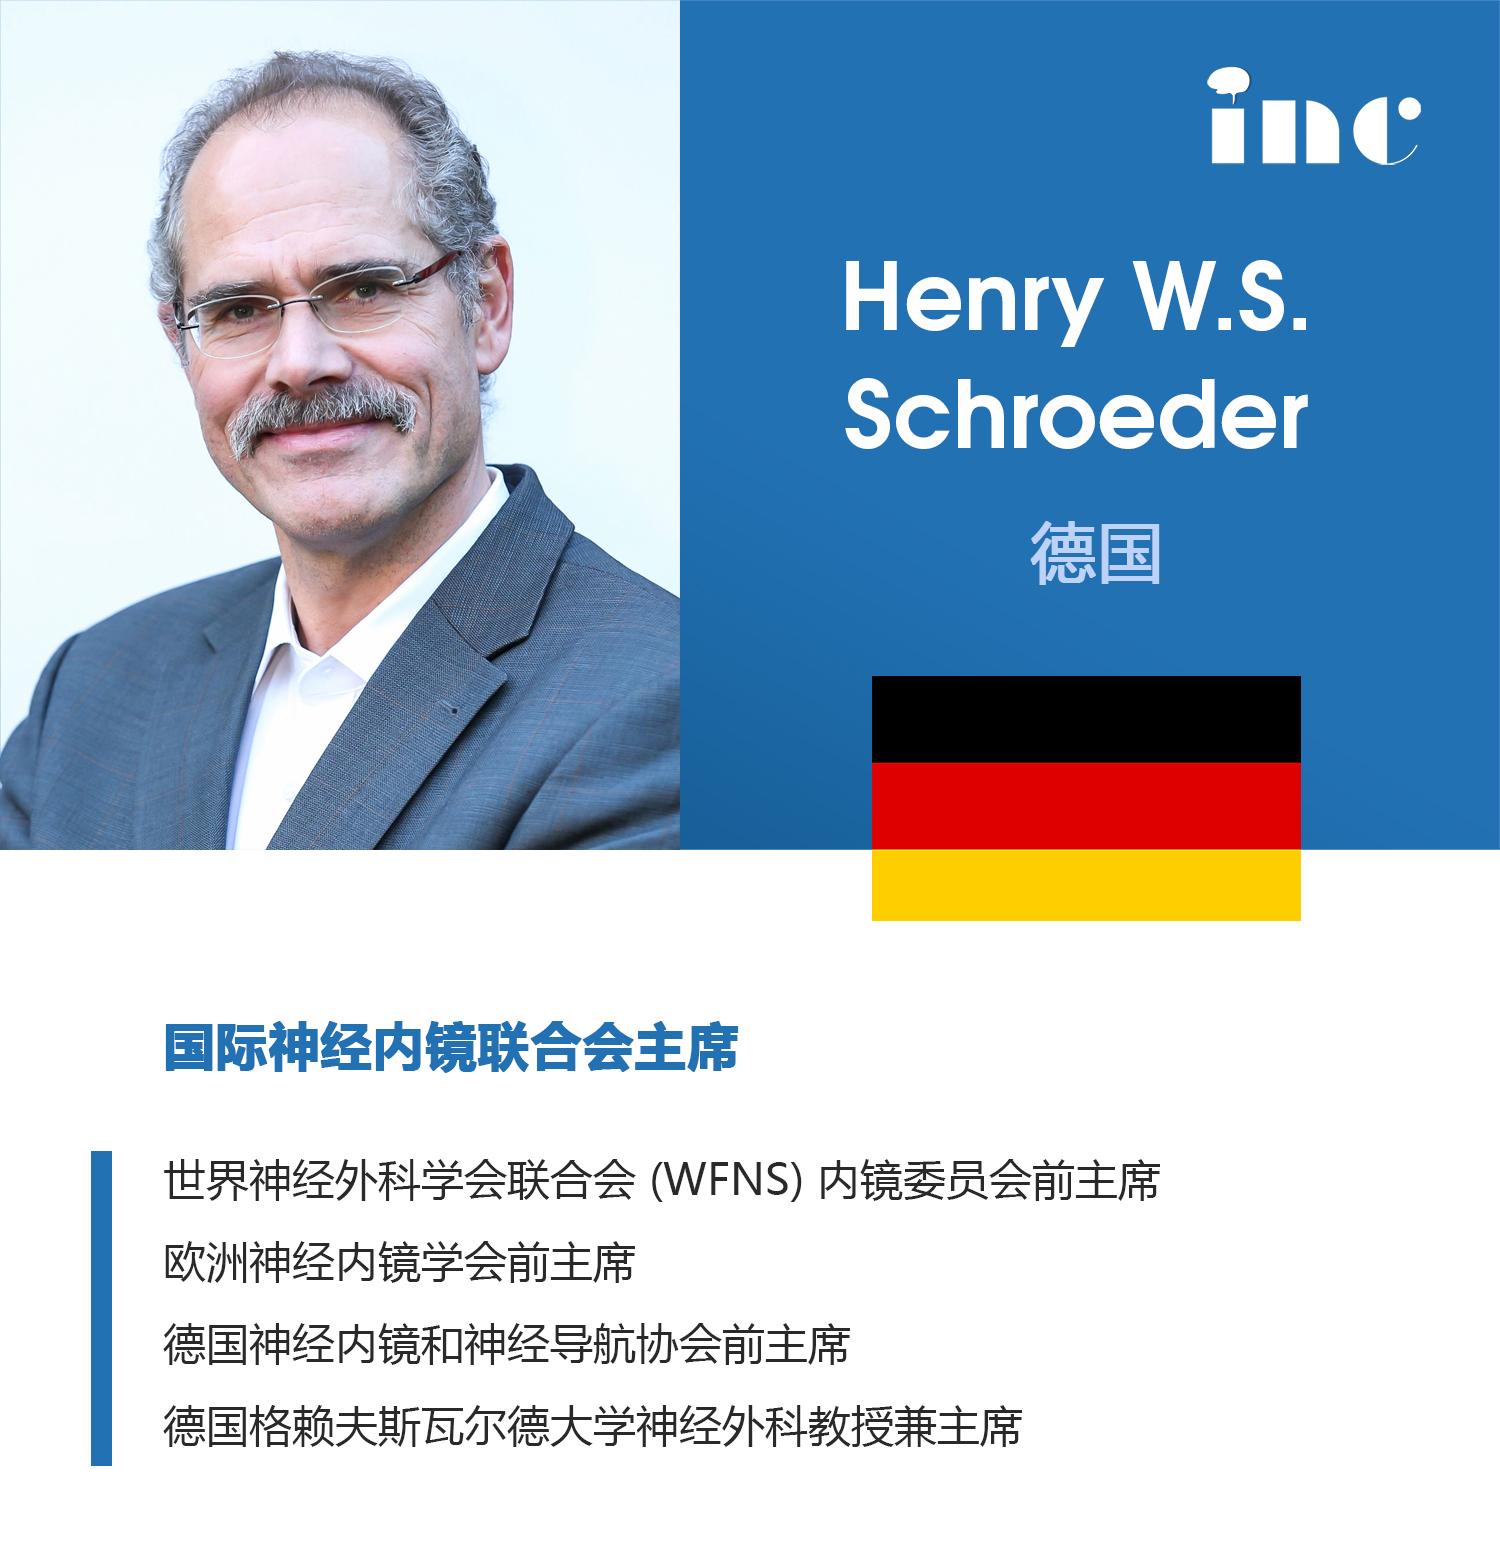 INC德国Henry W. S. Schroeder教授